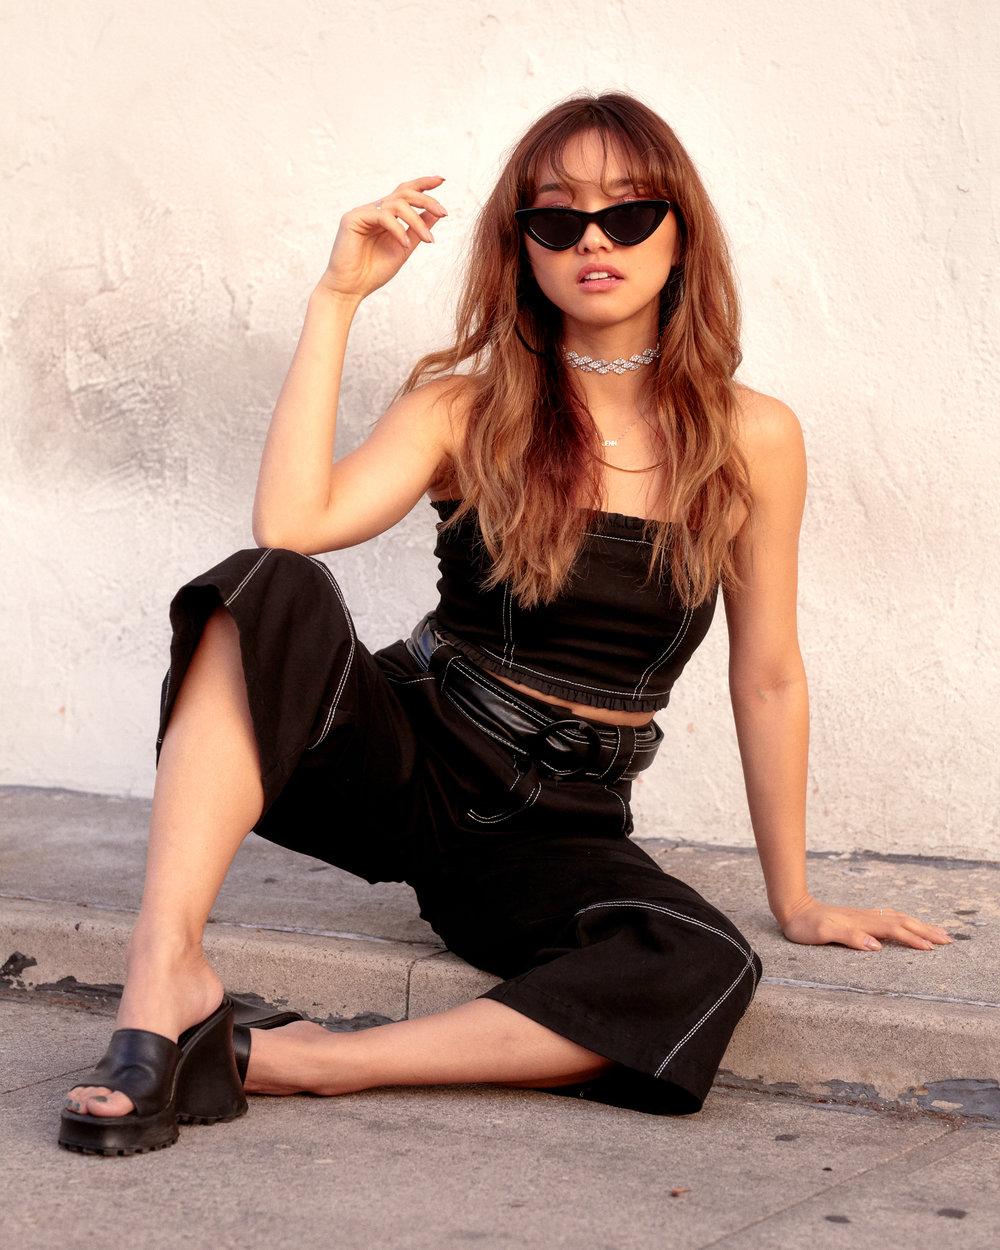 Jenn Im for The Eggie Shop, Styled by Kaemi Shot by Keith Oshiro